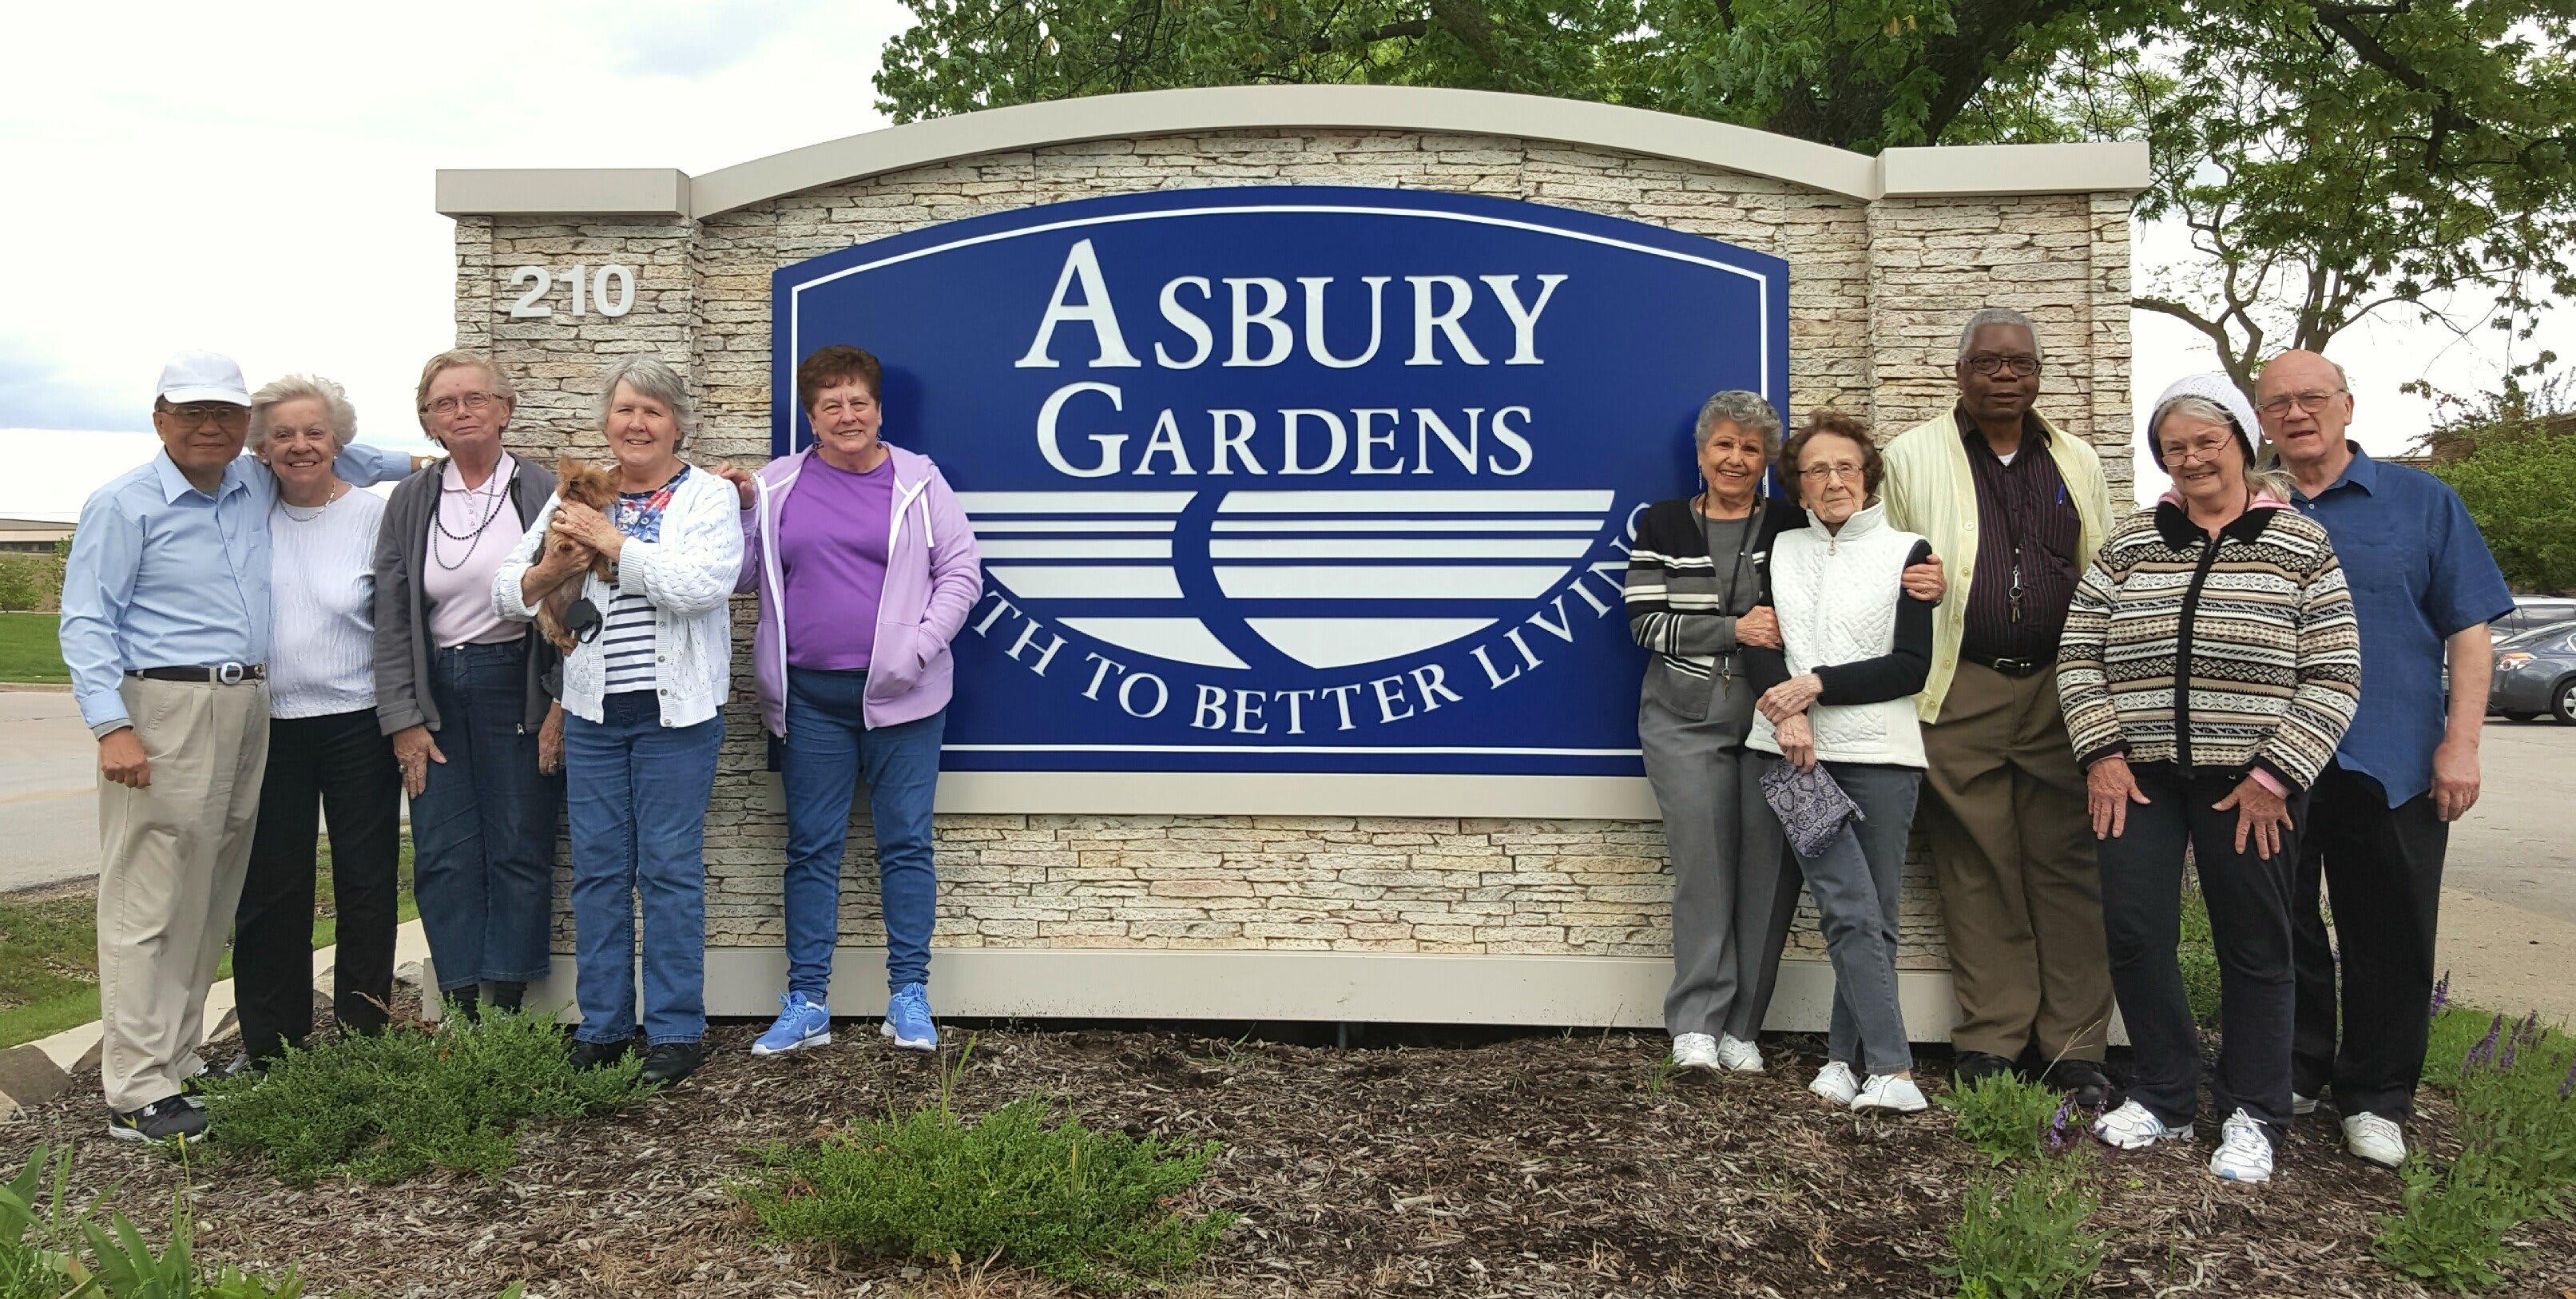 Photo 1 of Asbury Gardens